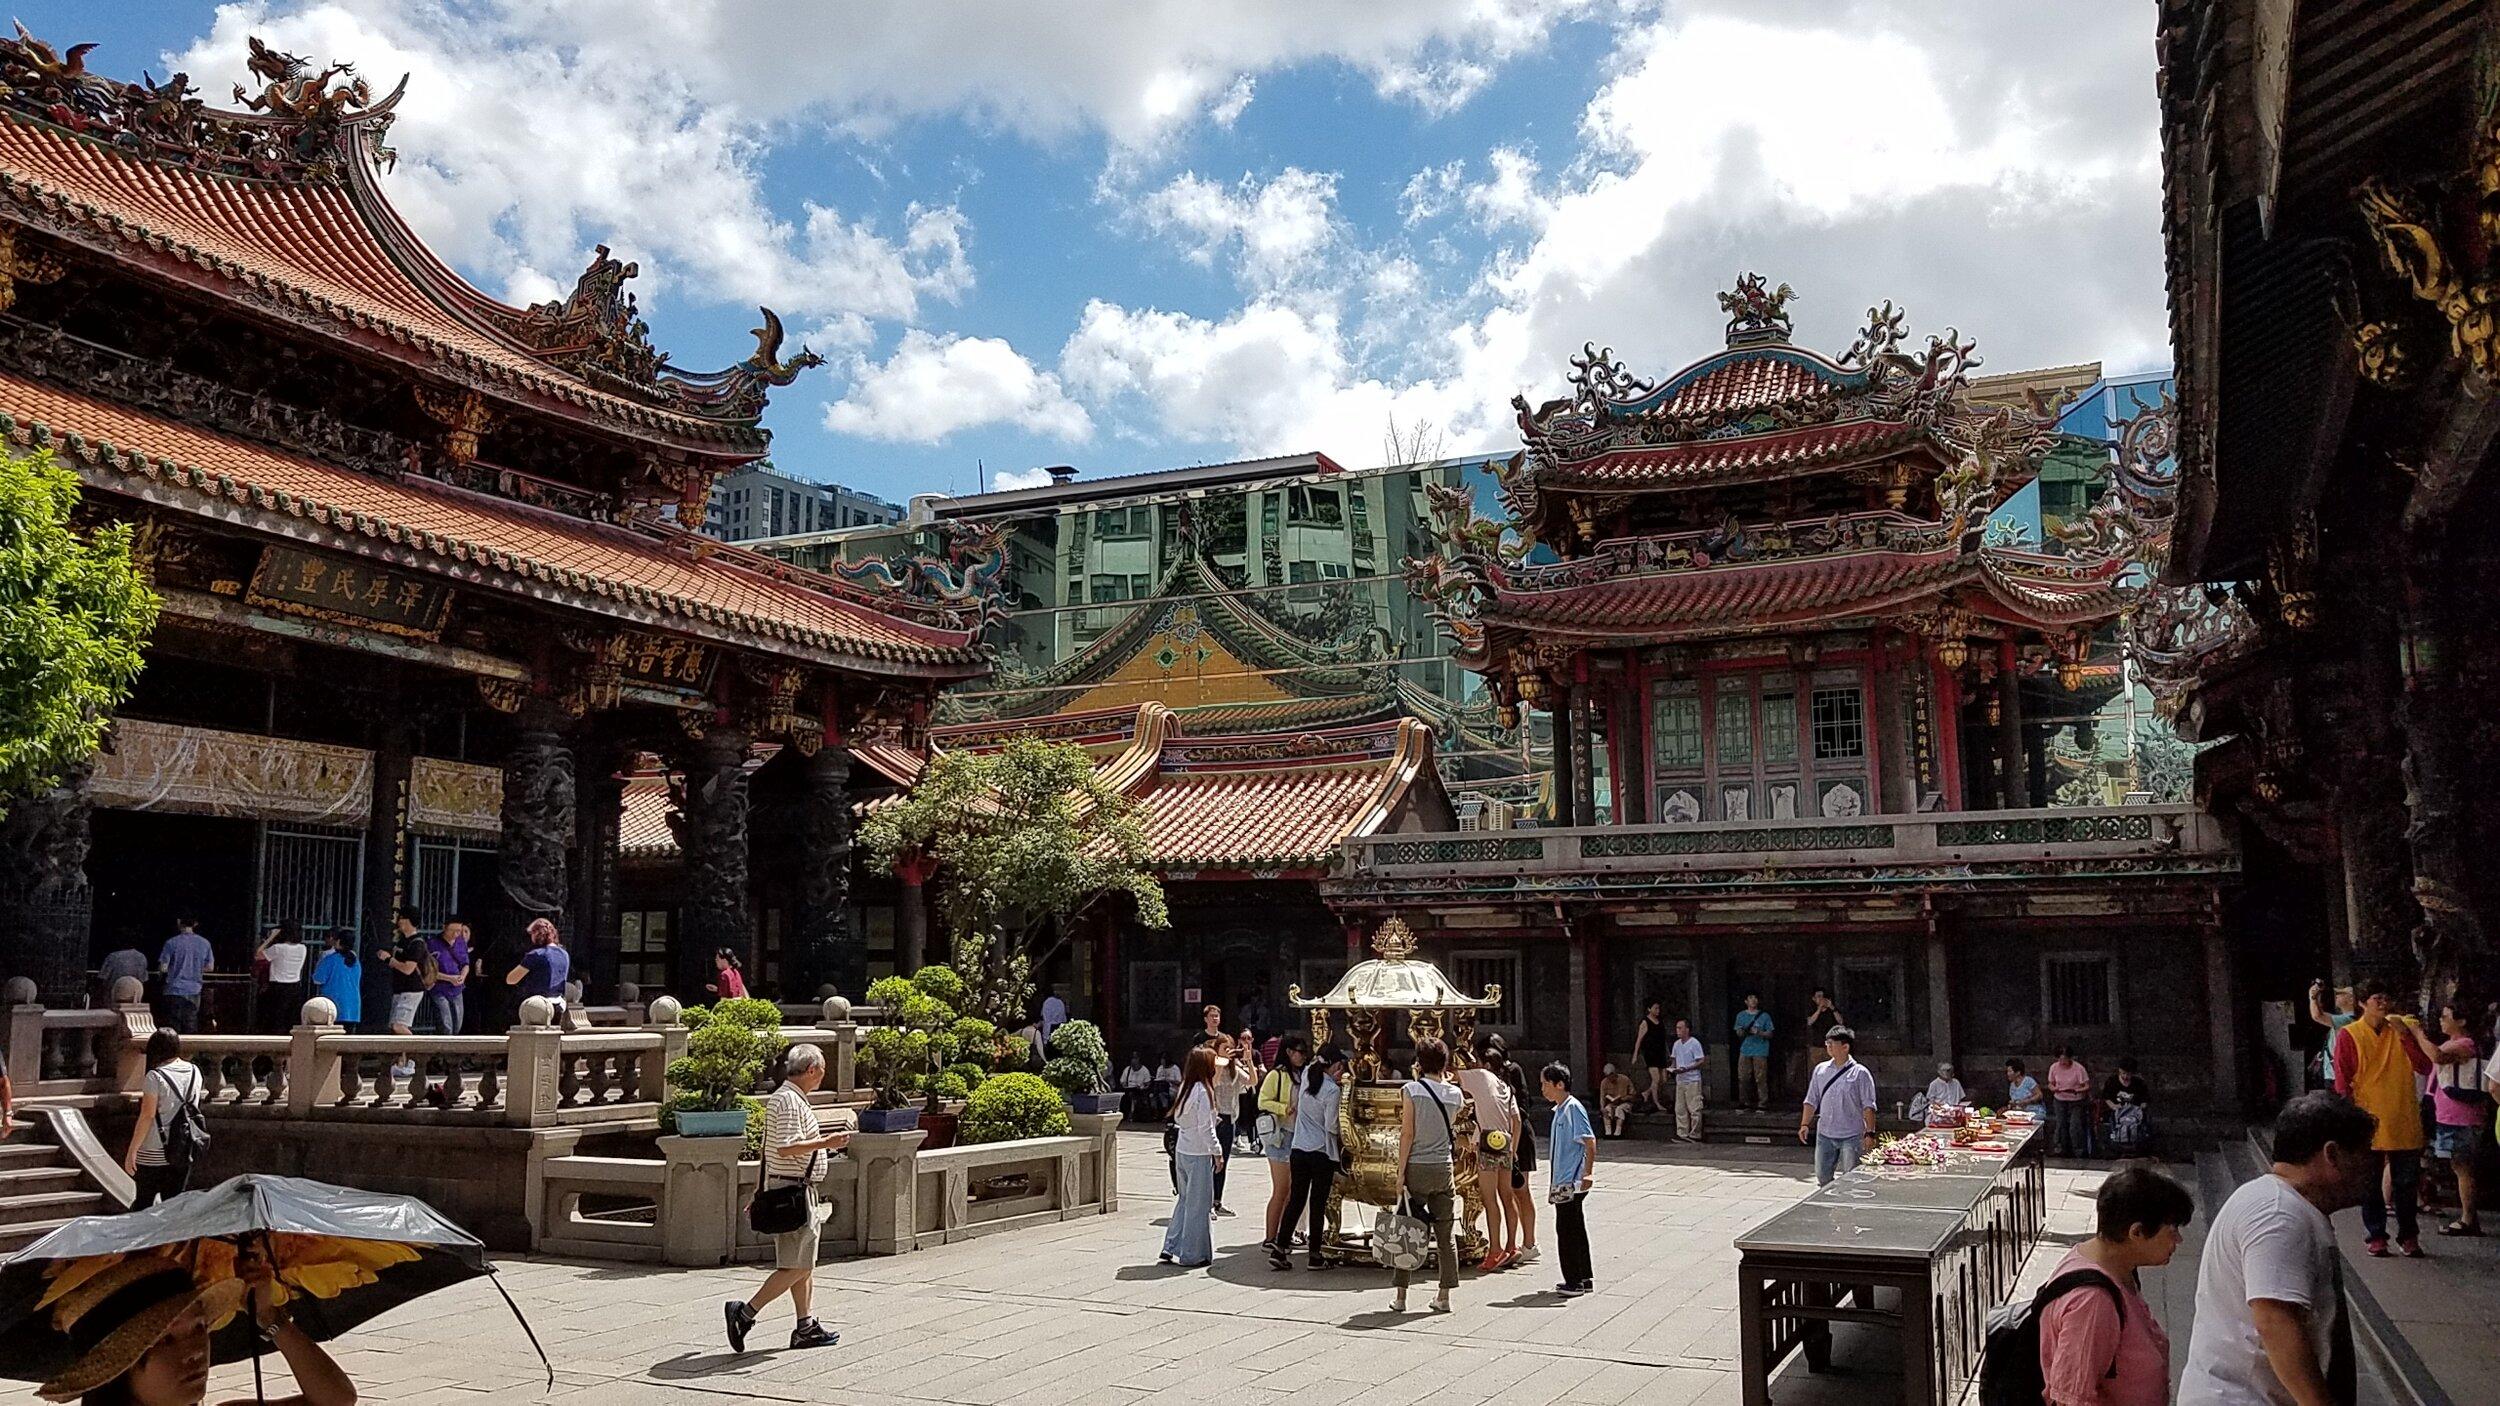 Longshan Temple, a contemplative oasis